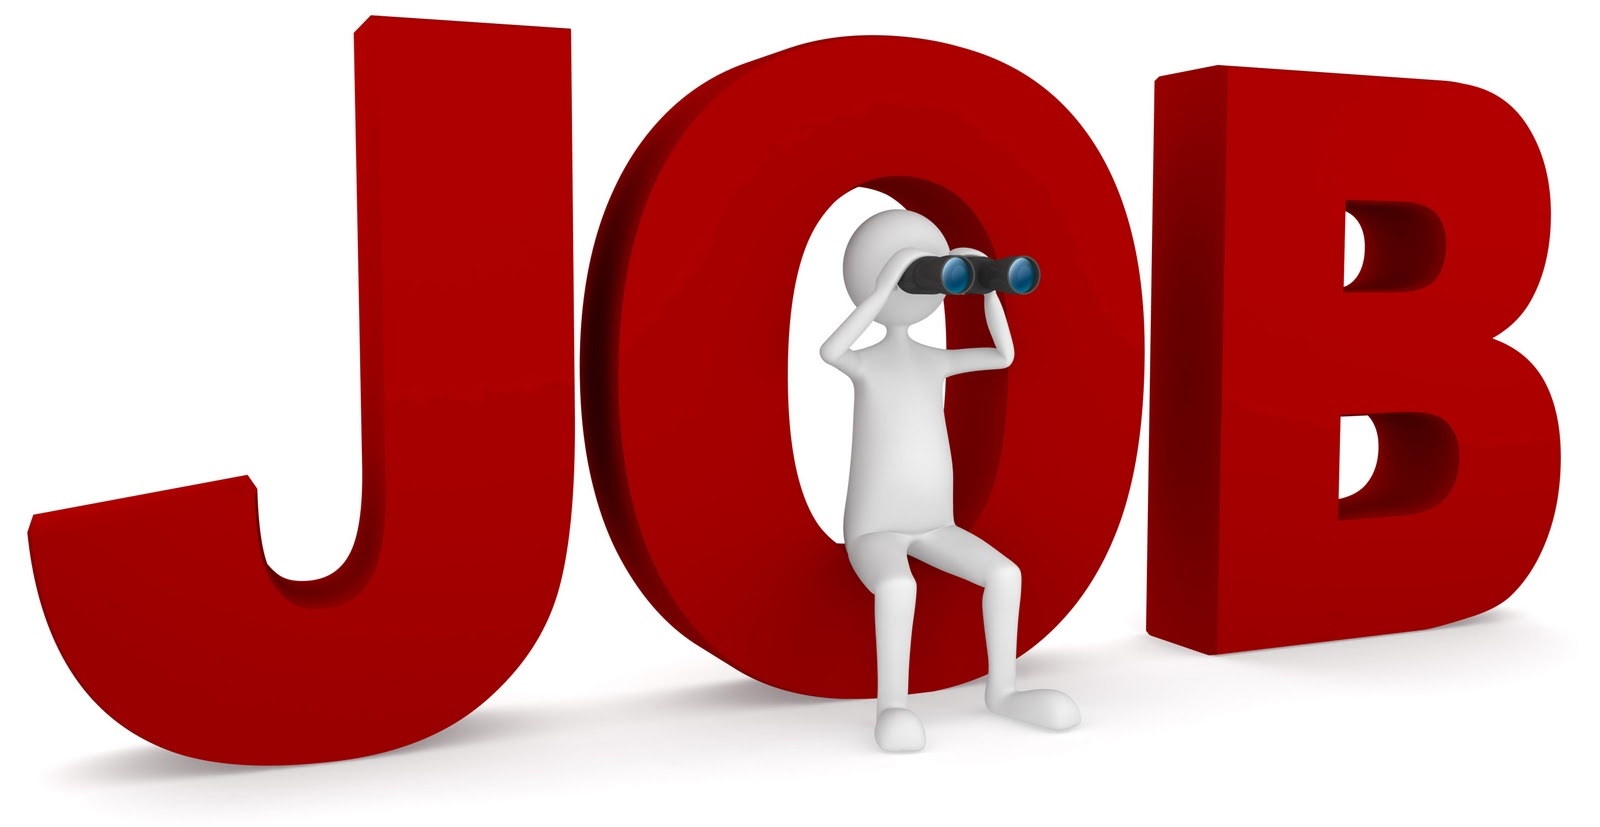 Service Engineer (Electrical) - Job In Dubai